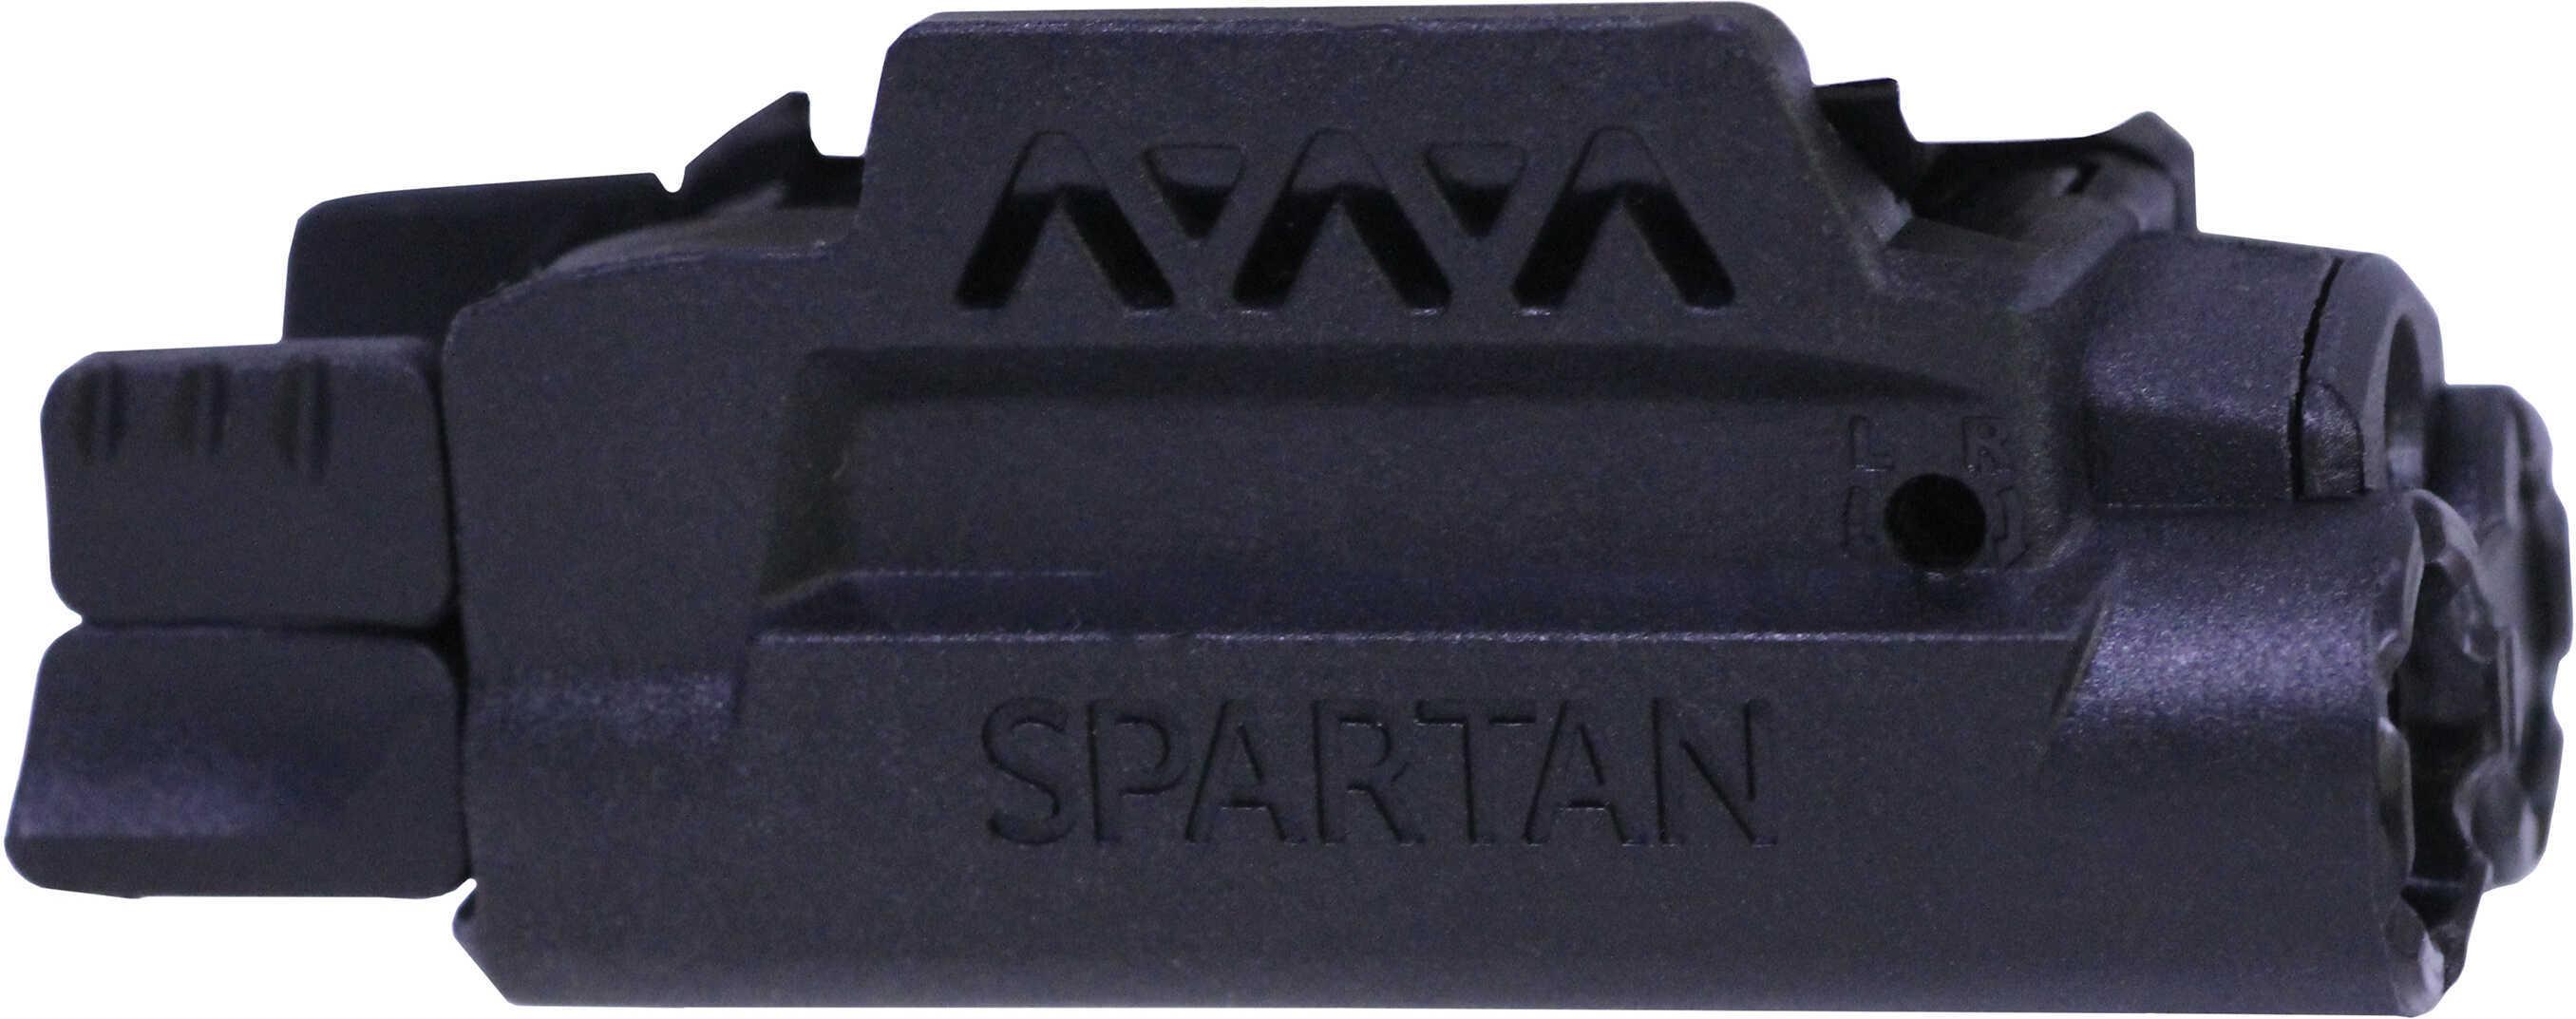 LM Spartan Rail Mount Laser/Light Combo Green